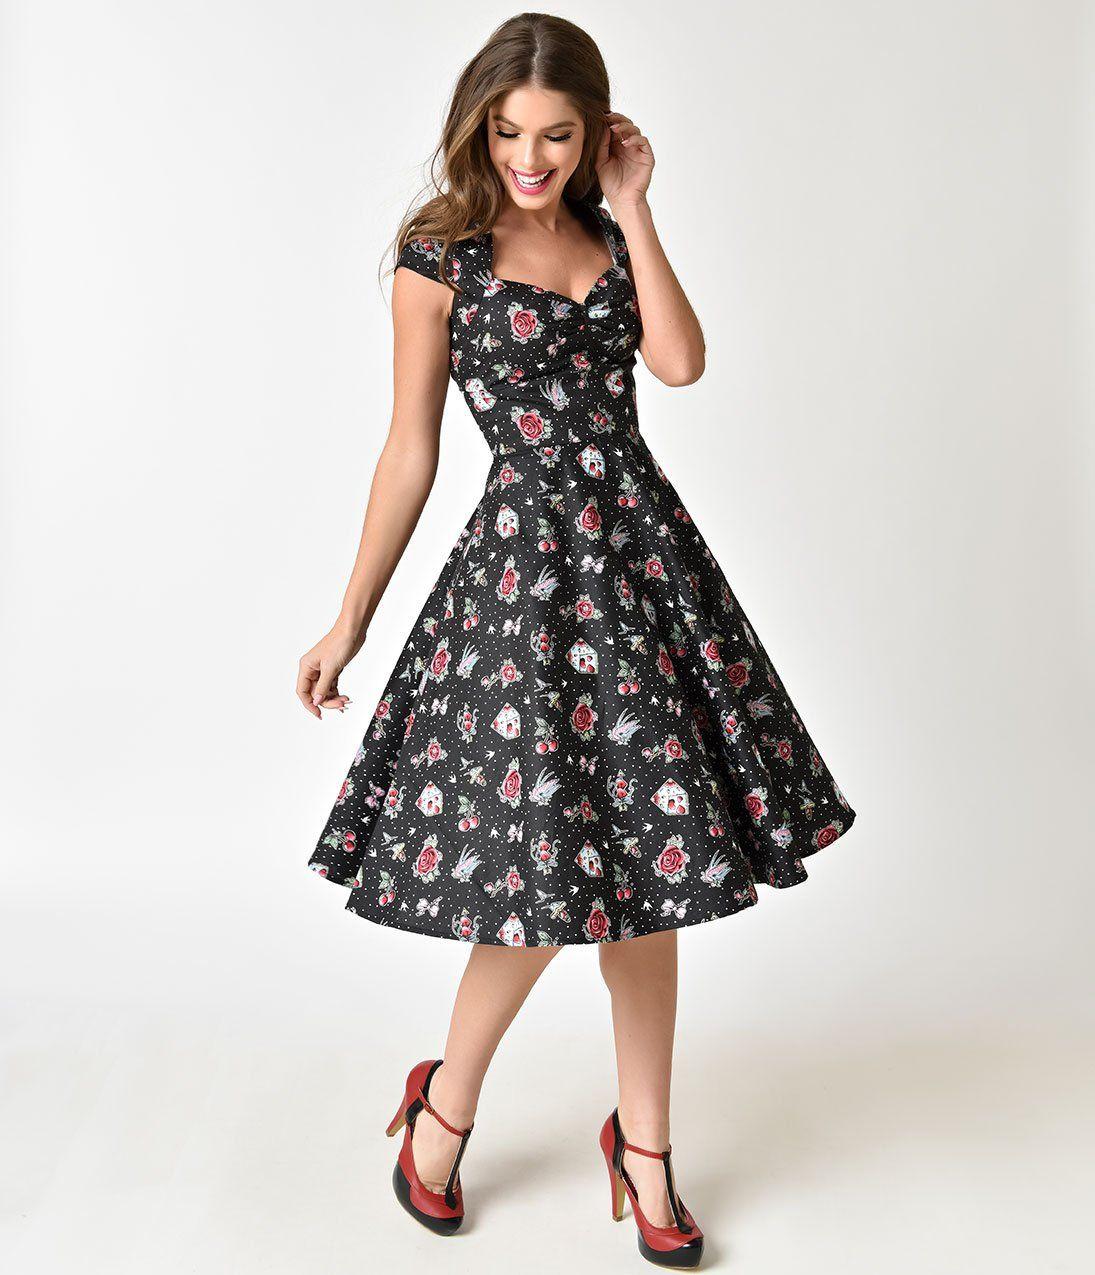 0d9a9d8a9dbc Hell Bunny Black & Traditional Print 1950s Style Stevie Cotton Dress –  Unique Vintage